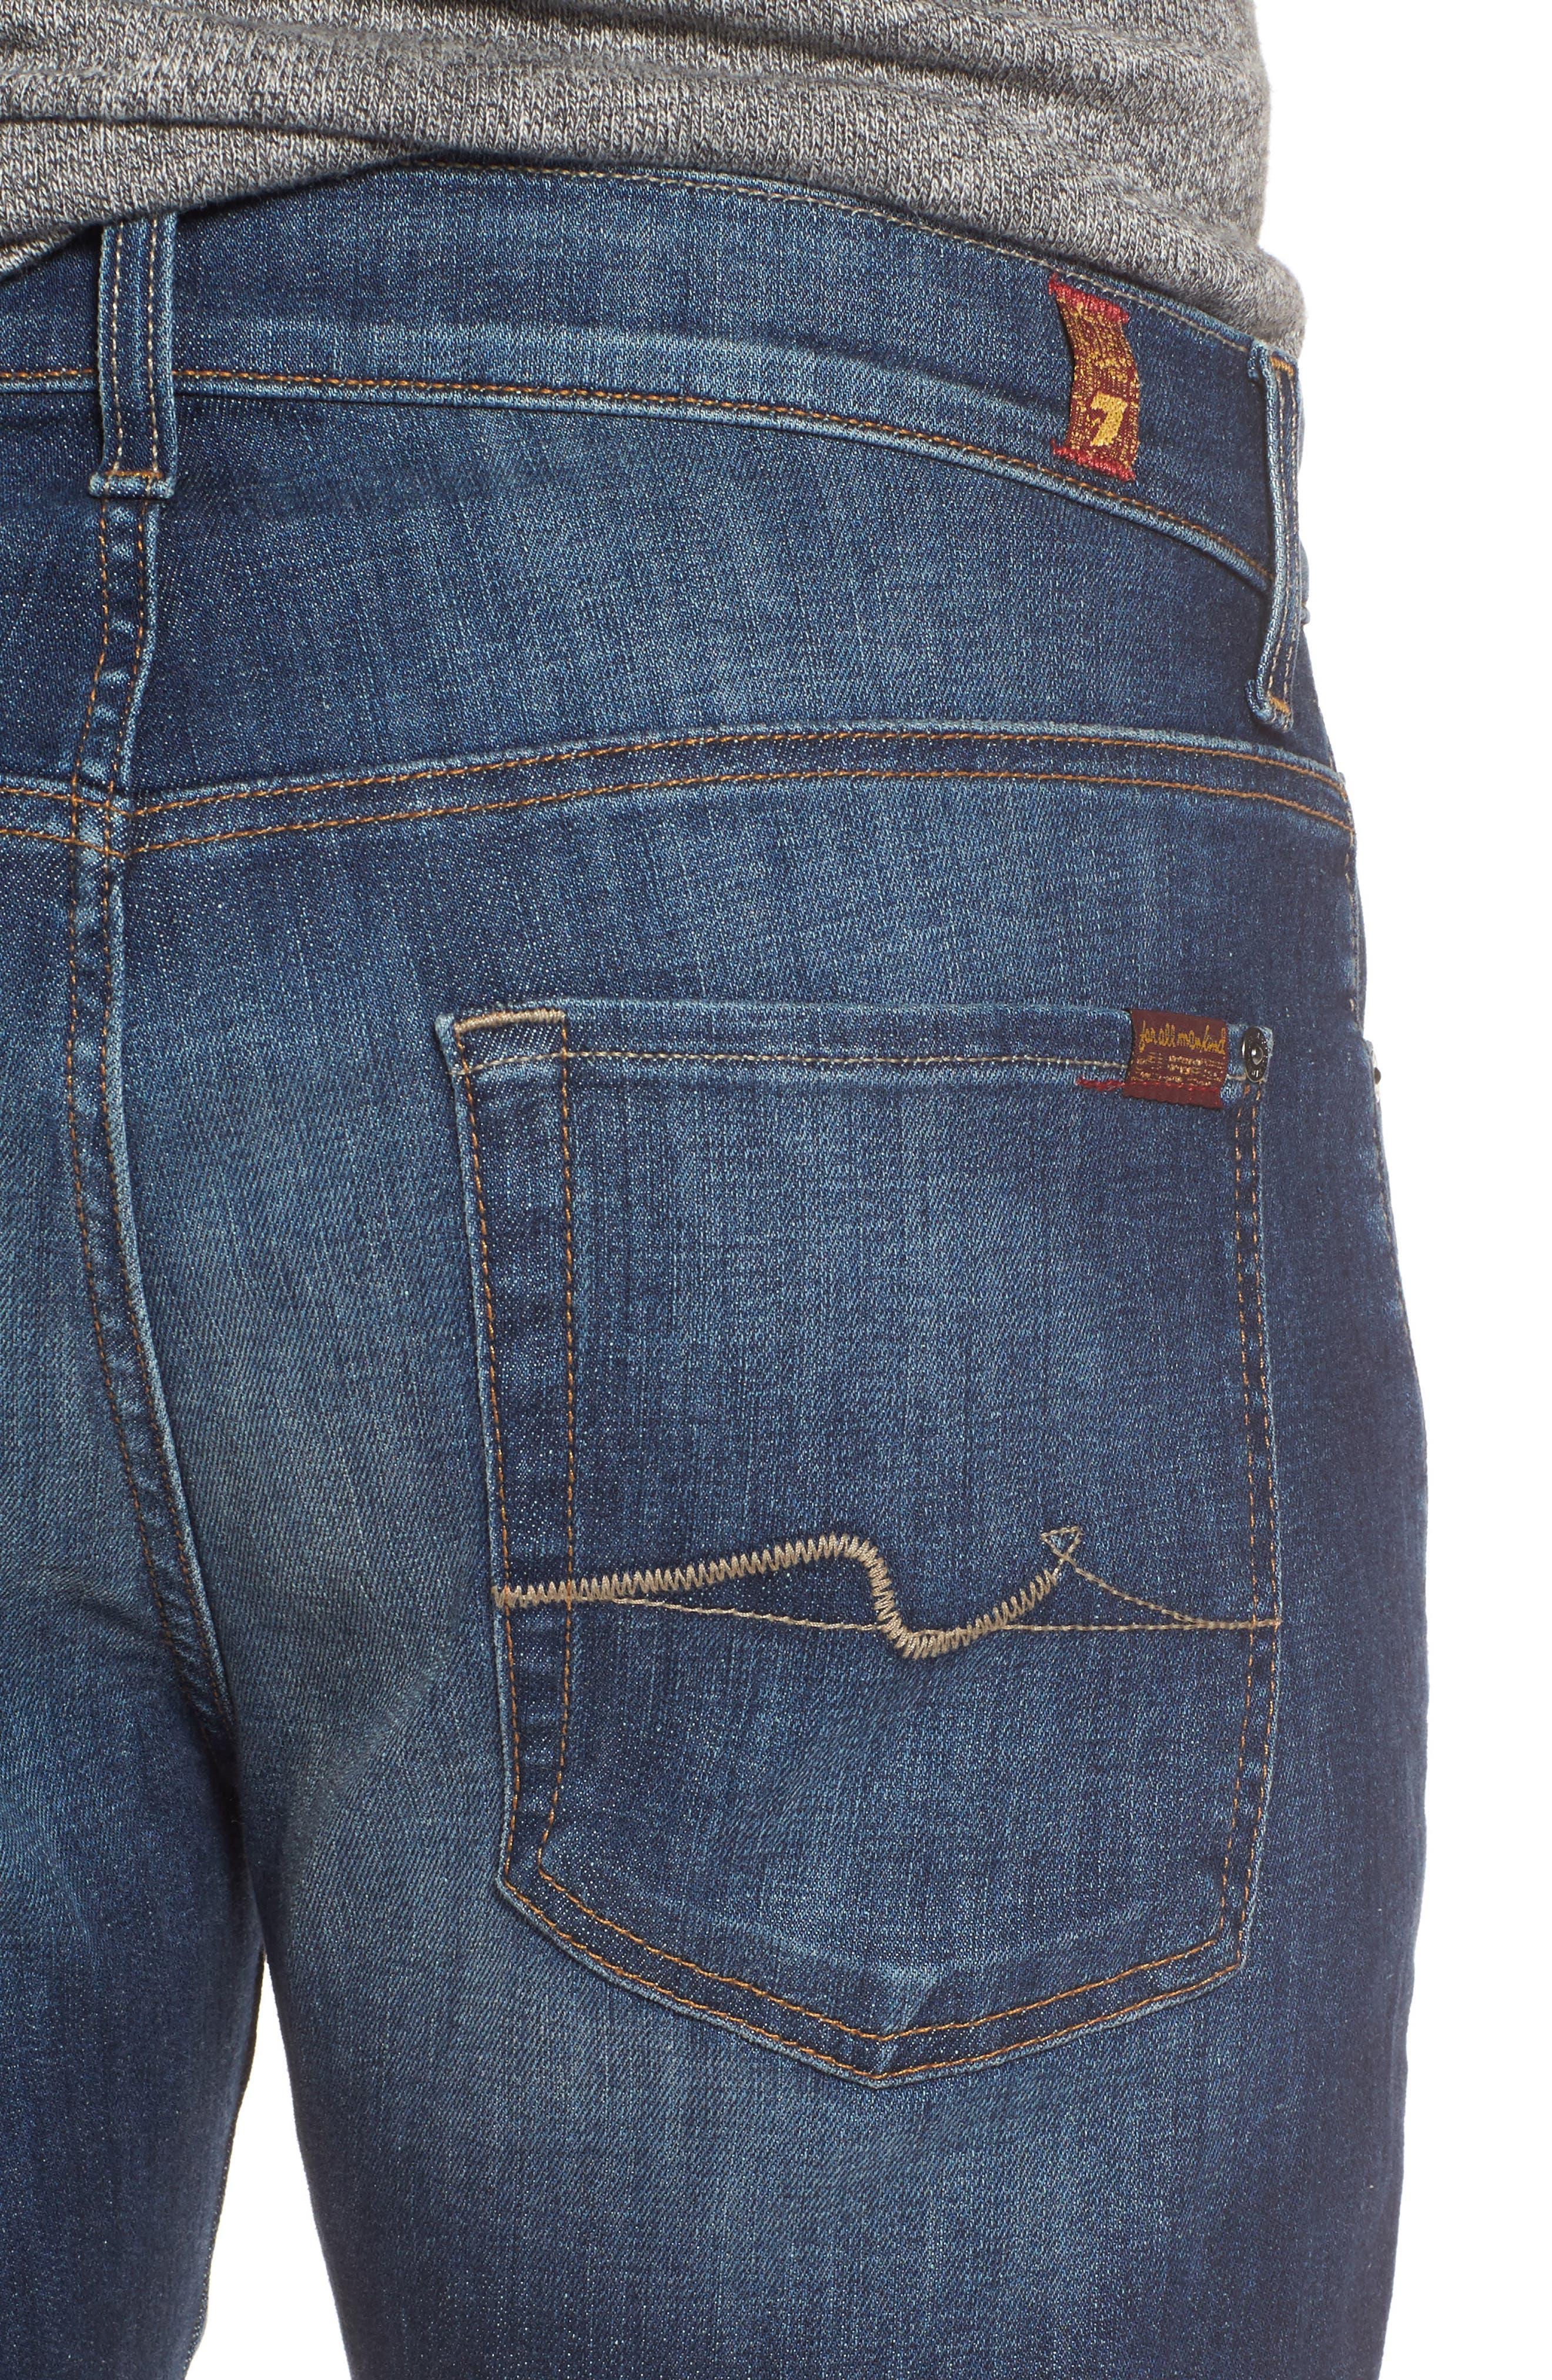 Brett Bootcut Jeans,                             Alternate thumbnail 4, color,                             400